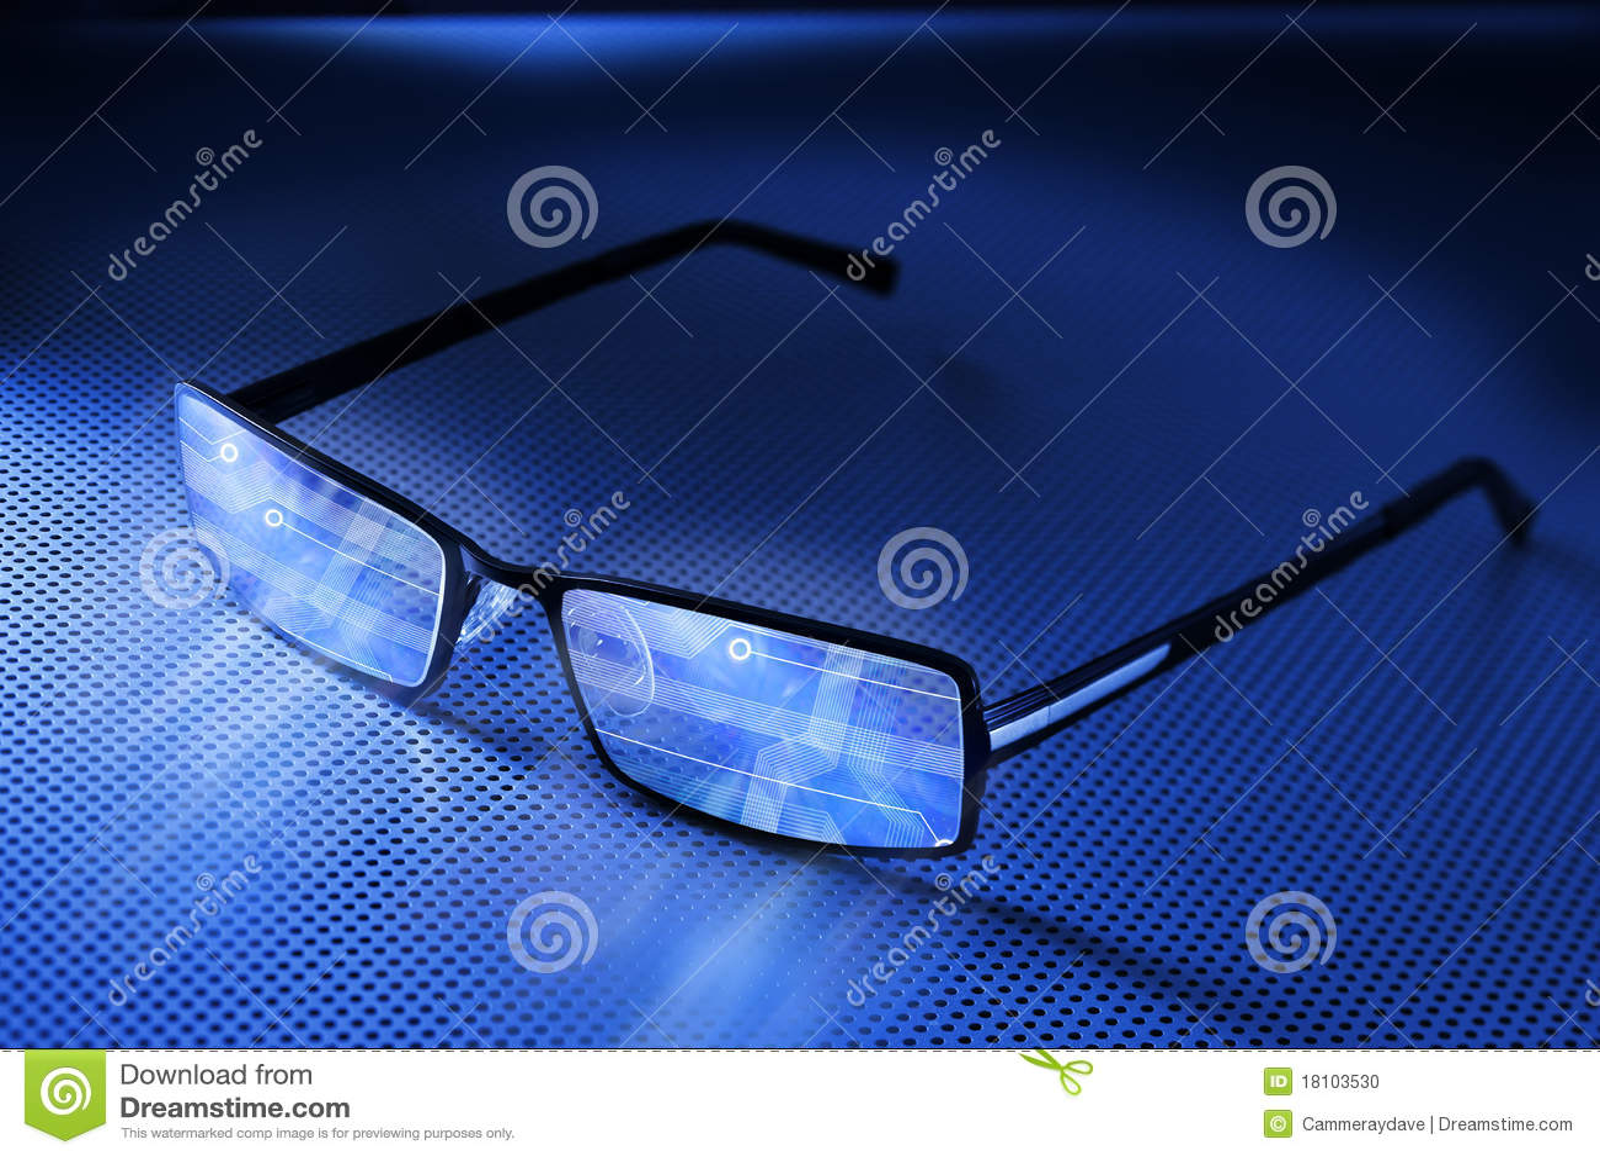 Computer Smart Eye Glasses Technology